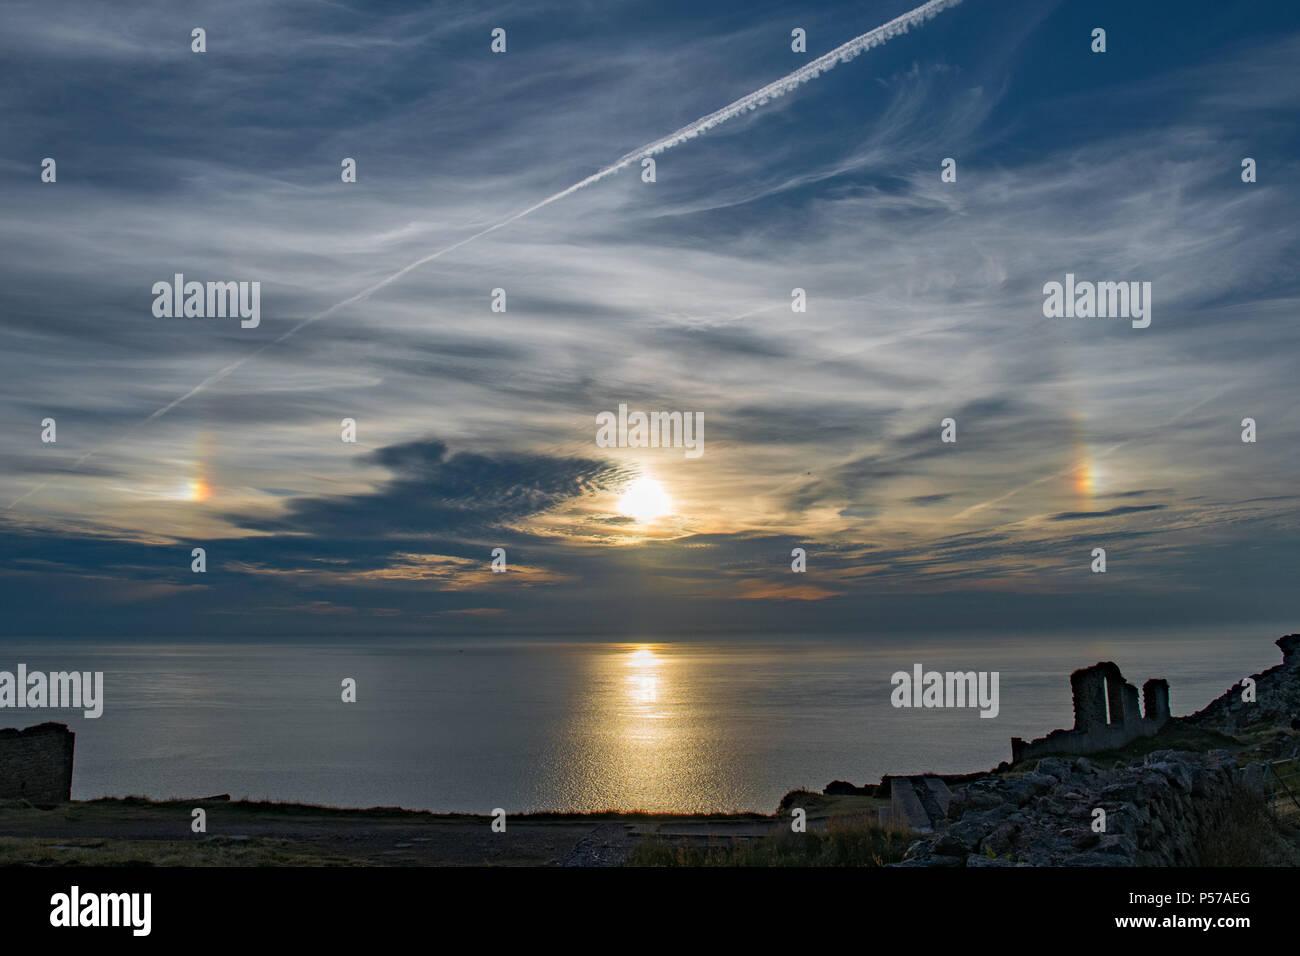 Sundog or parhelion around the setting sun over the sea at Botallack at Cornwall - Stock Image